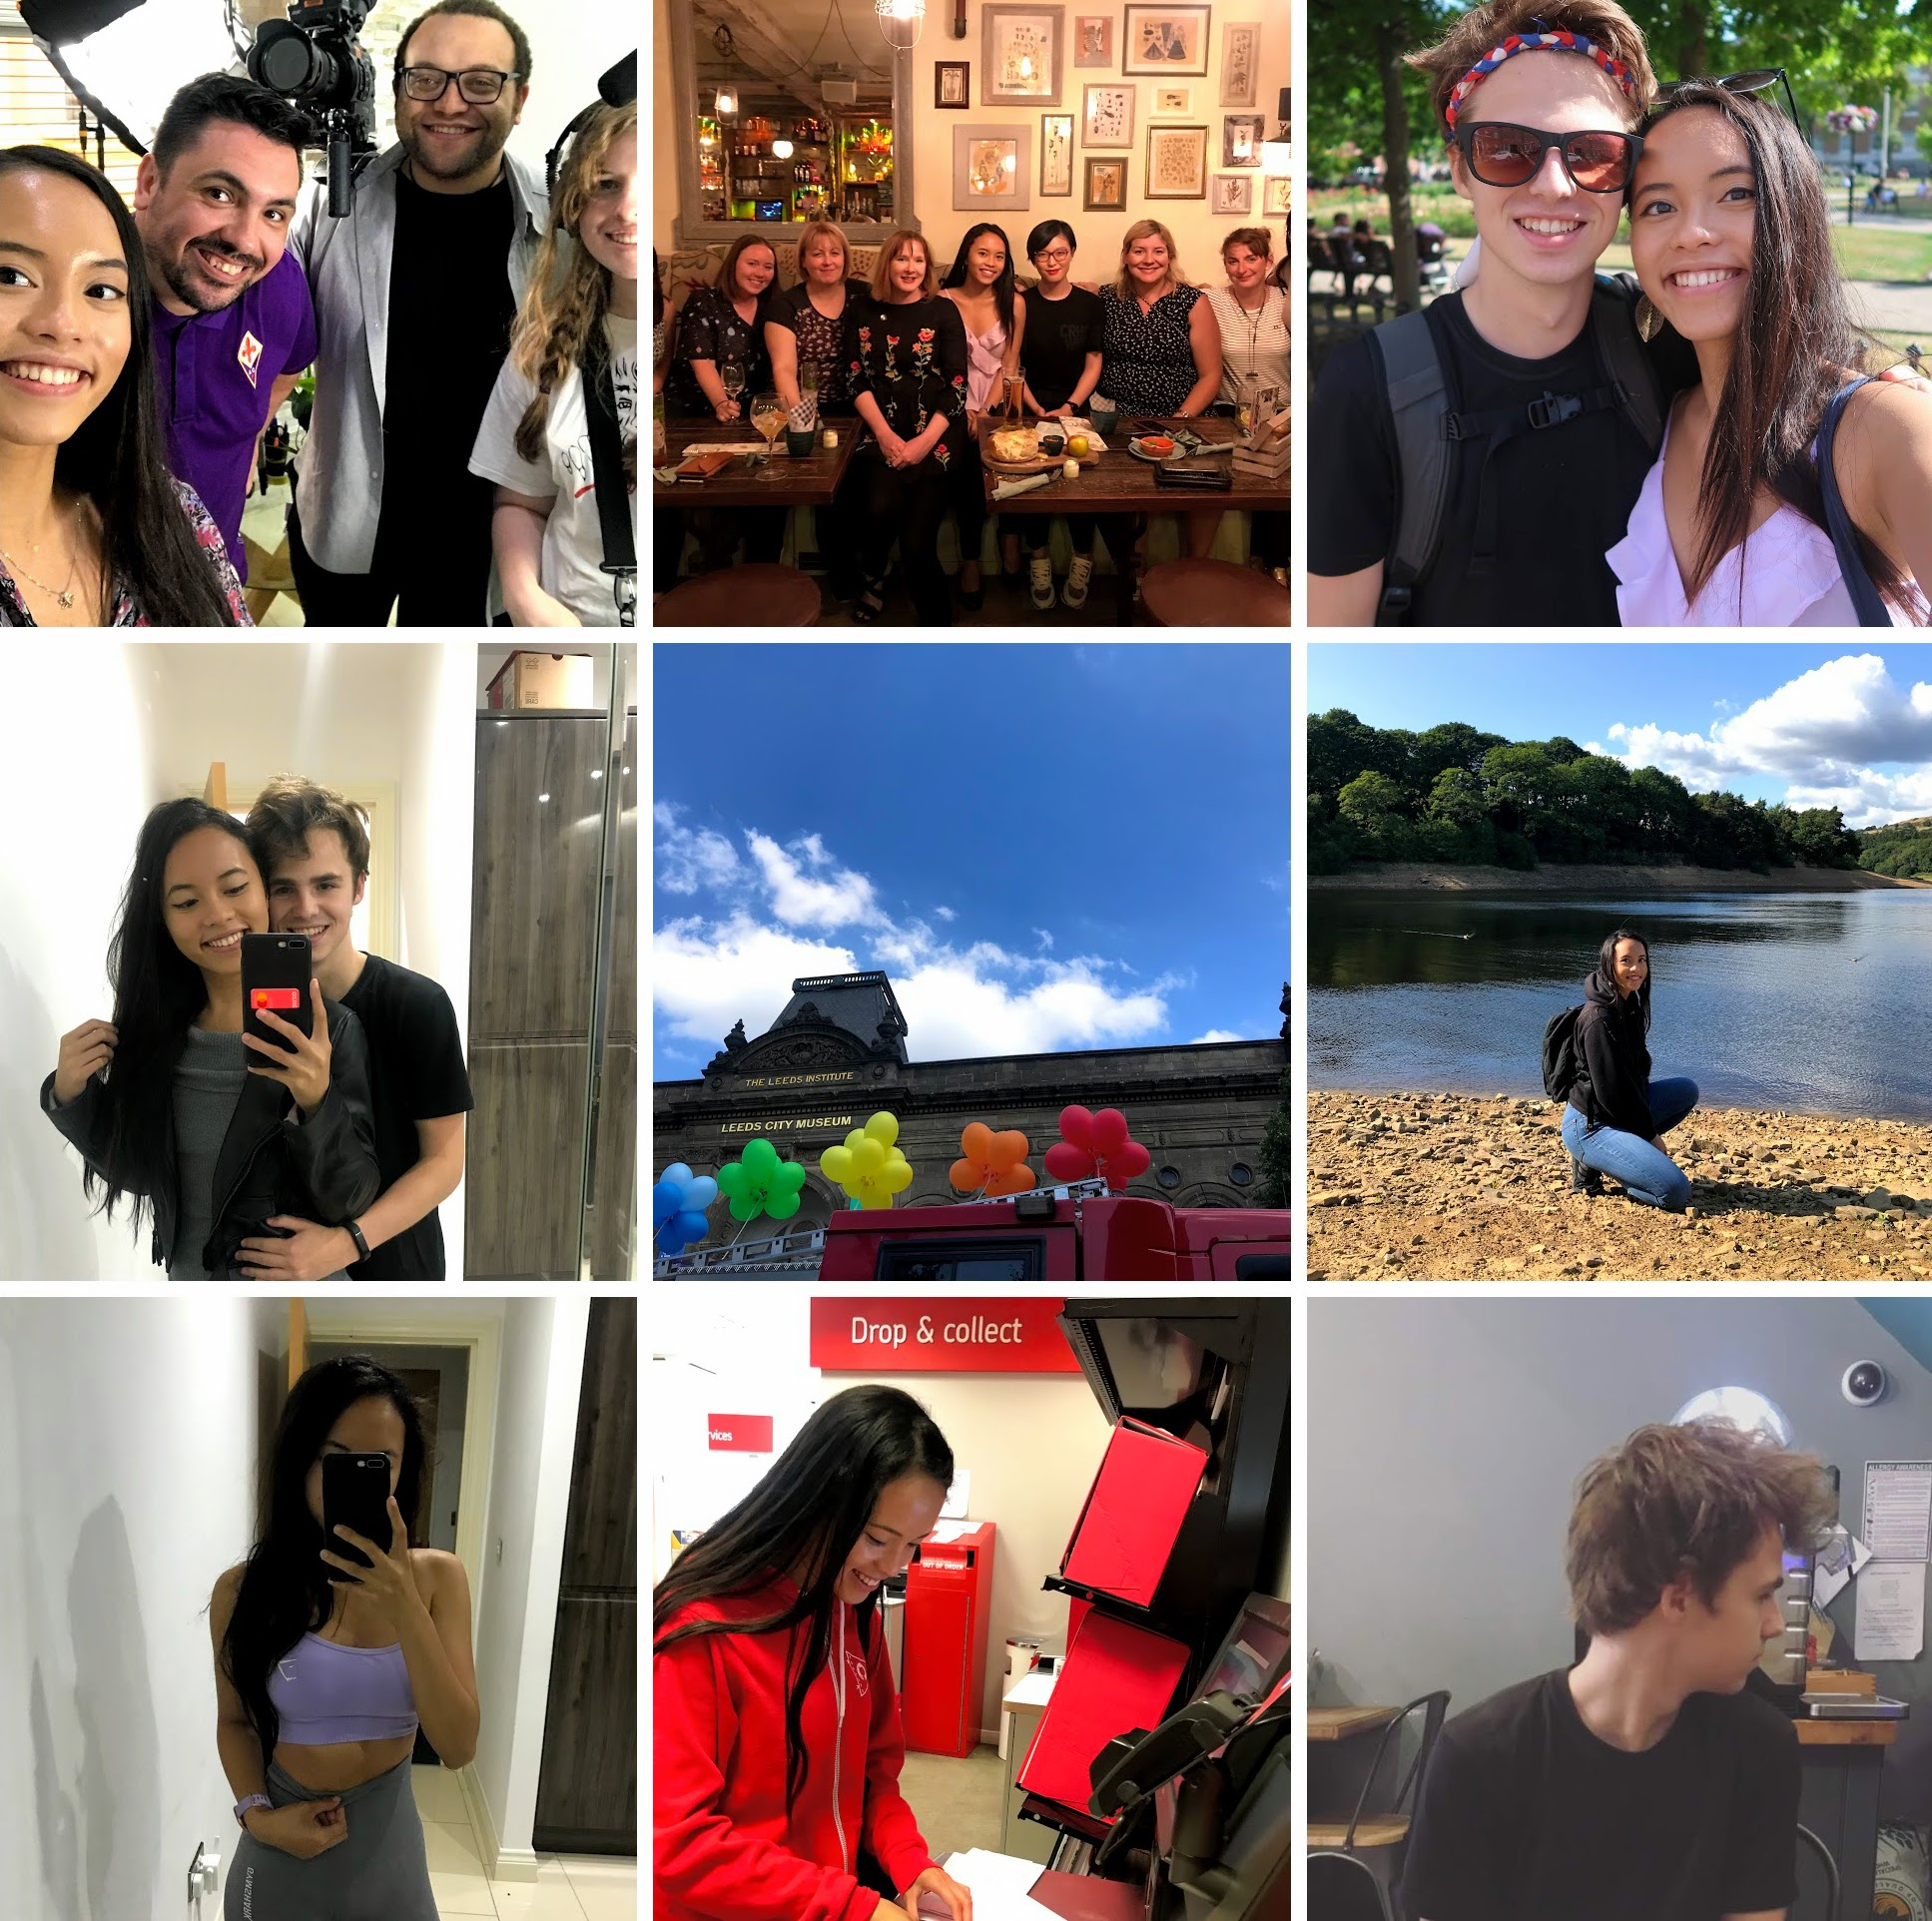 From left to right: Filming for BBC Bitesize, Women in Tech meet-up, Matt & I (x2), Leeds Pride, Damflask Reservoir, Selfie before the gym, sending stickers, Breakfast w/ Matt.